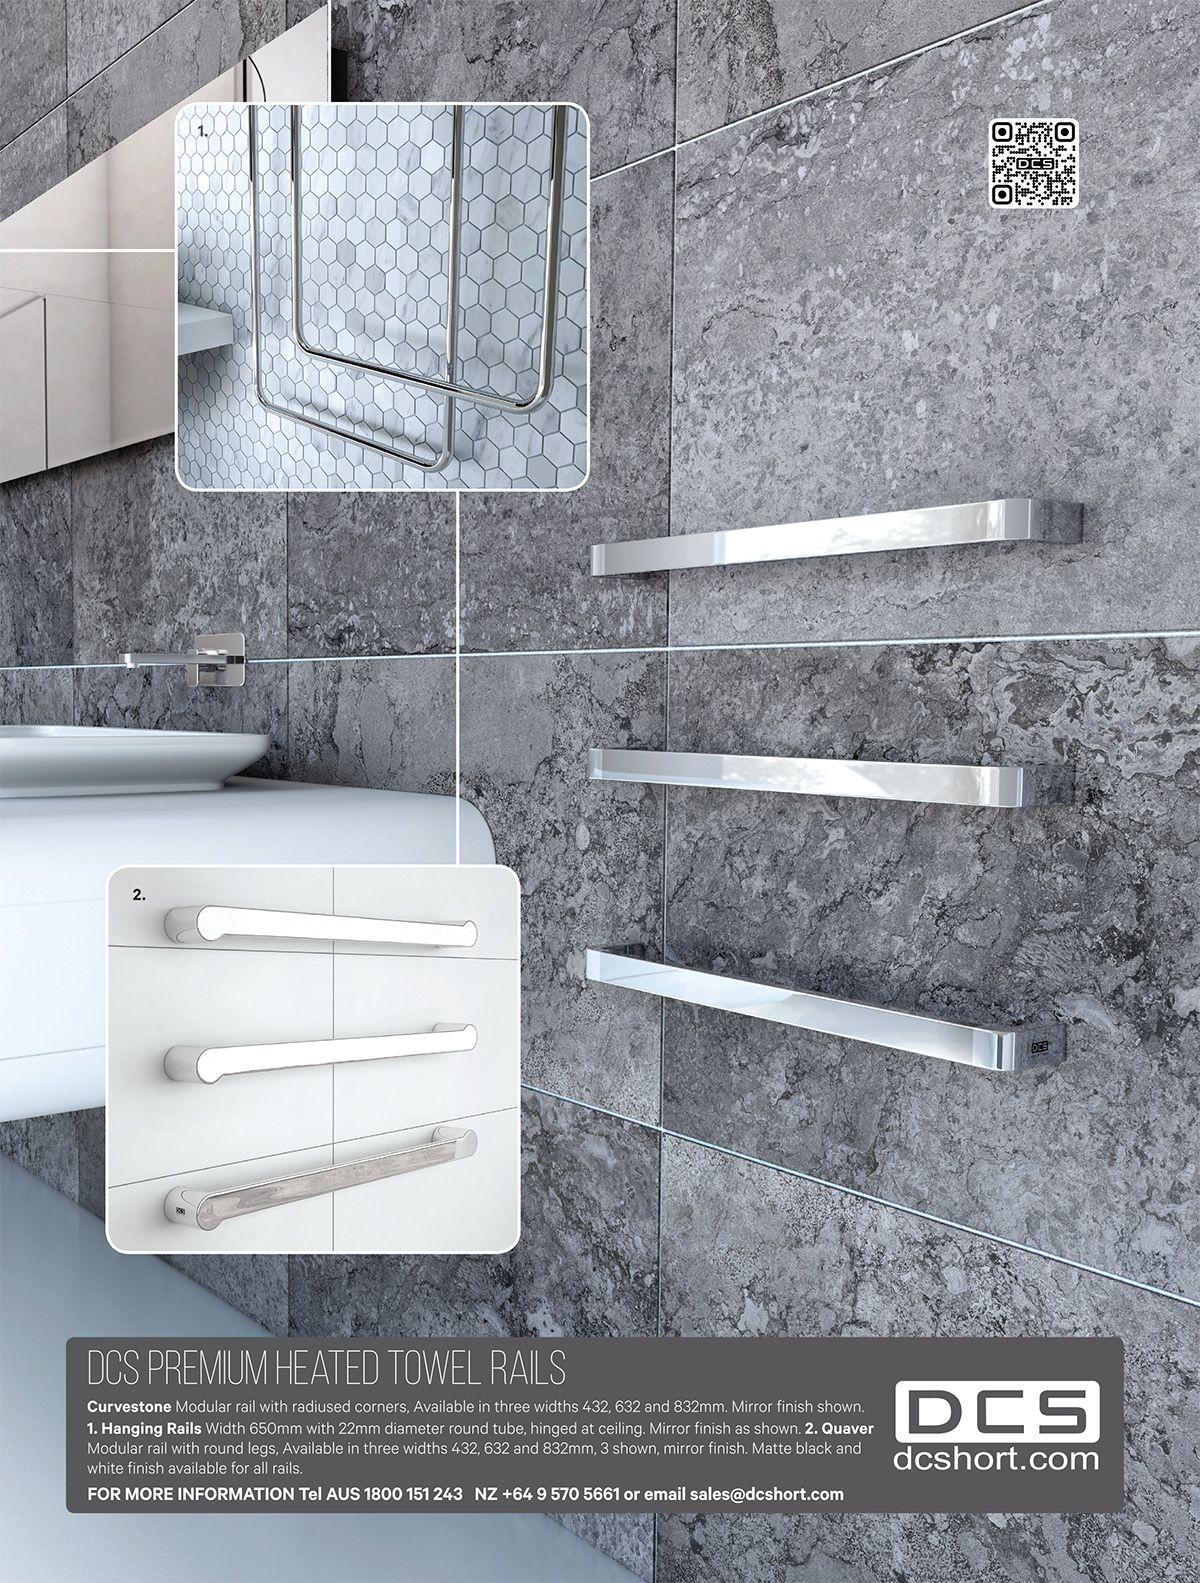 Trends 2015 - DCS Heated Towel Rails